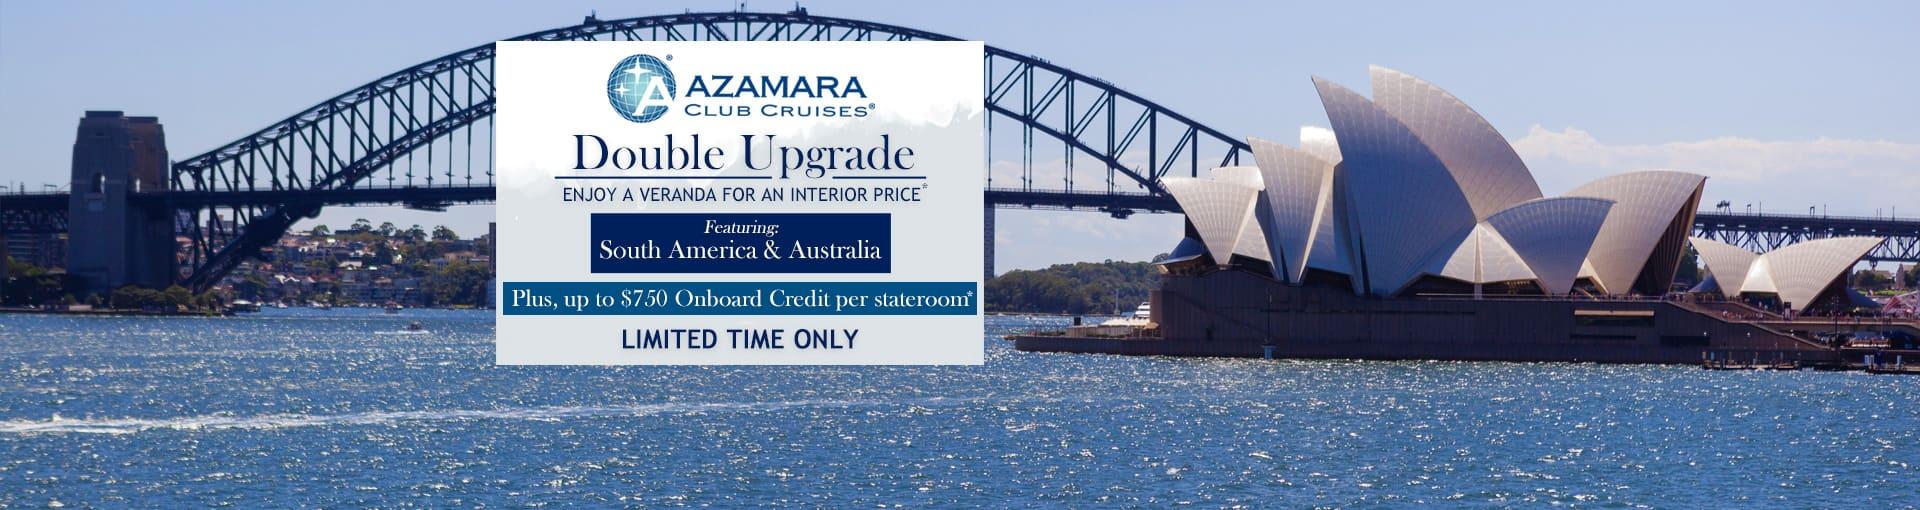 Azamara Club Cruises: Double Upgrade featuring South America and Australia